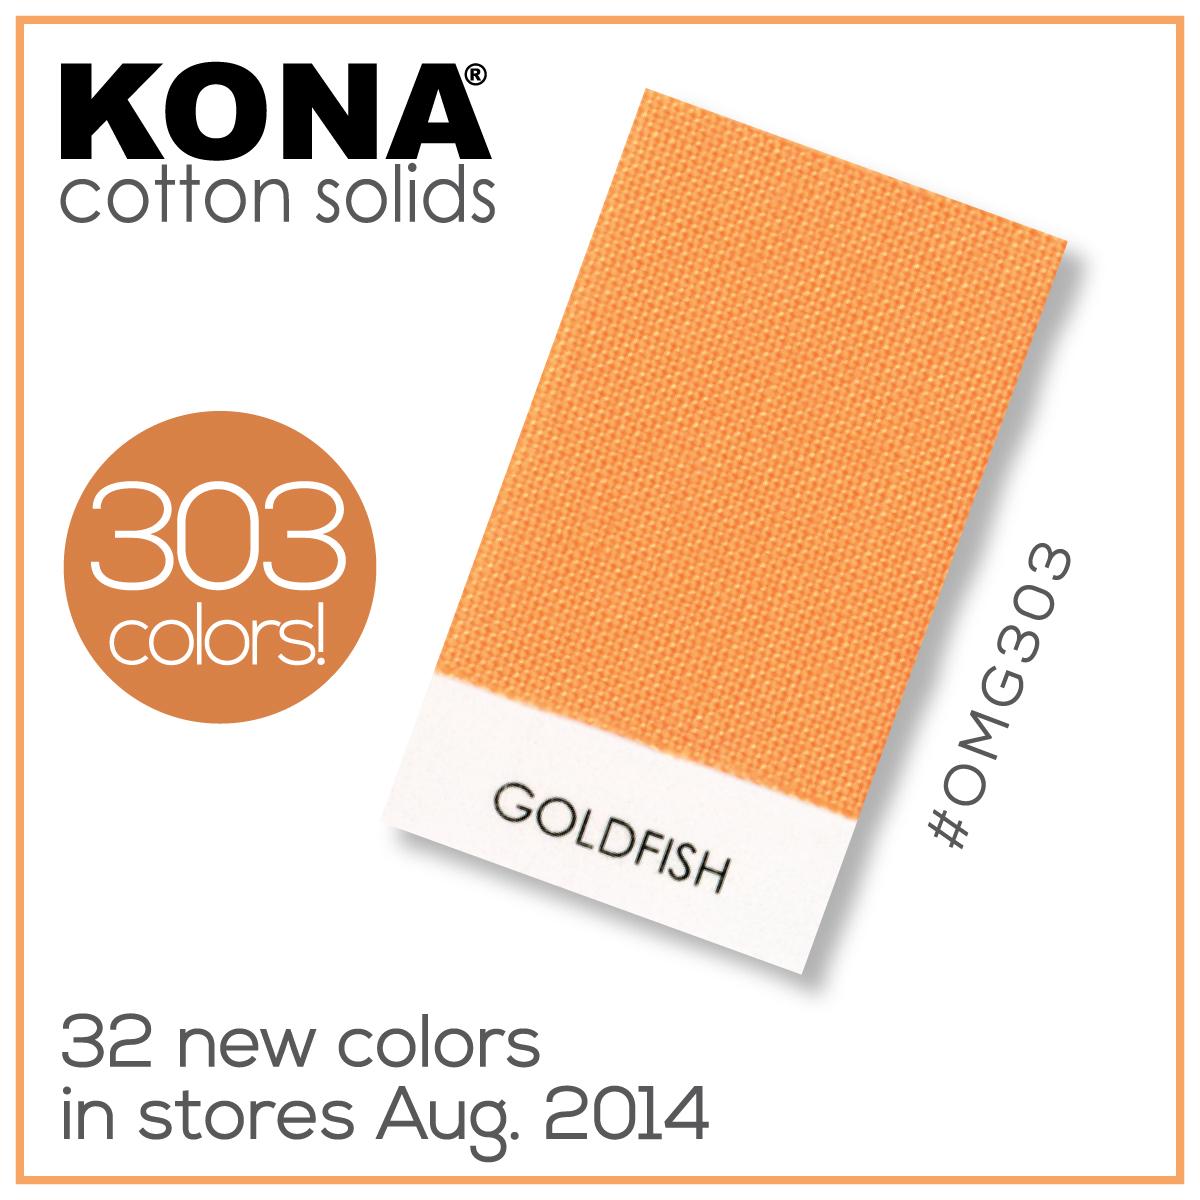 Kona-Goldfish.jpg